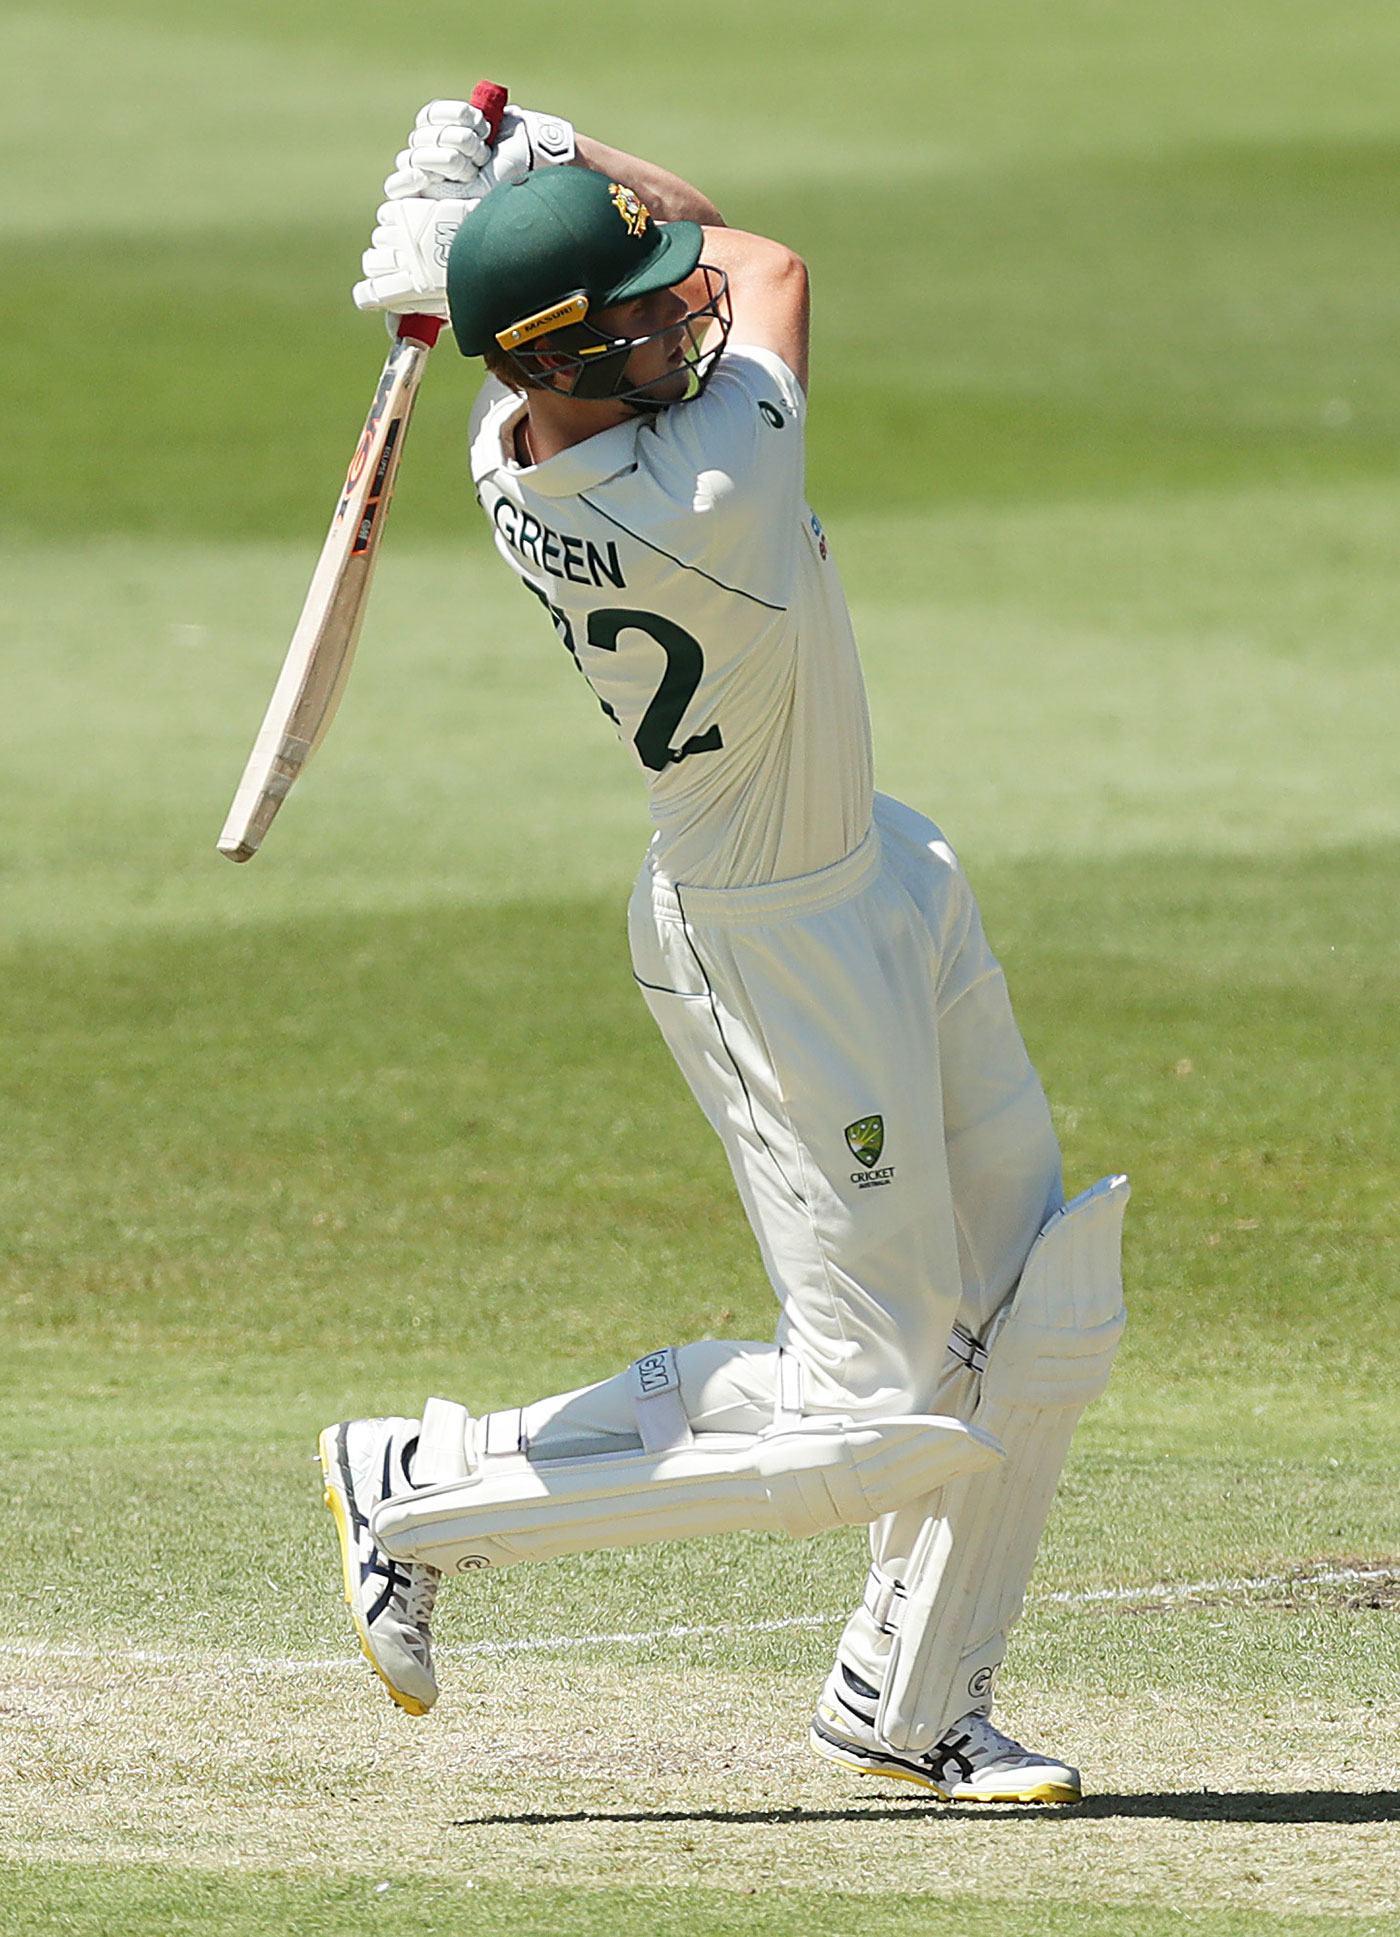 Cameron Green in Tallest Batsmen In Cricket History